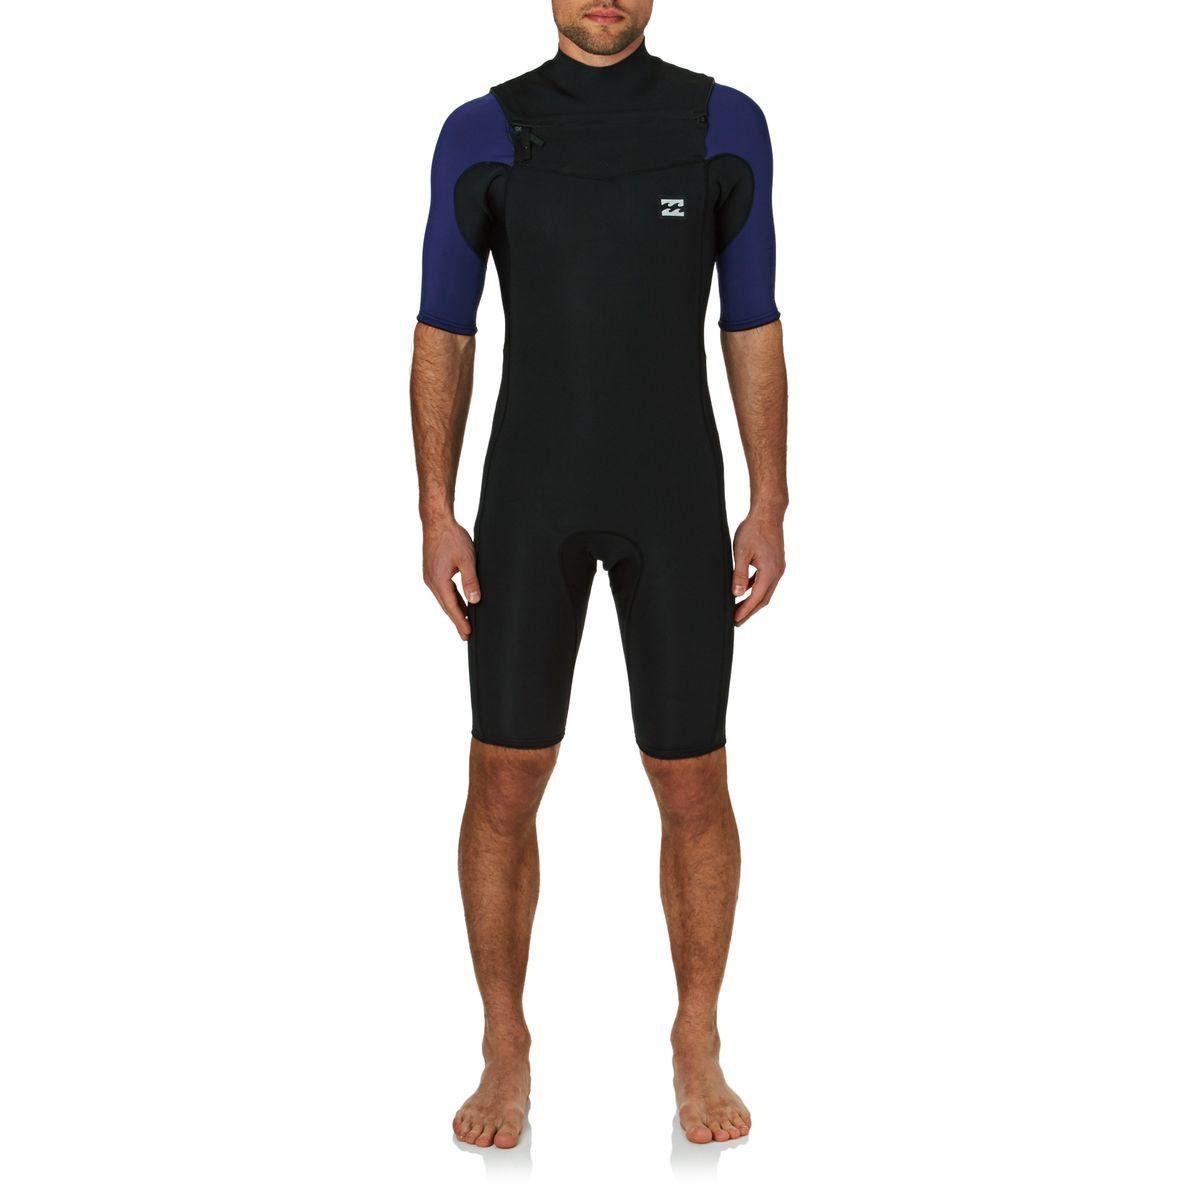 Billabong Revolution Tri Bong 2mm 2017 Short Sleeve Shorty Wetsuit - Navy